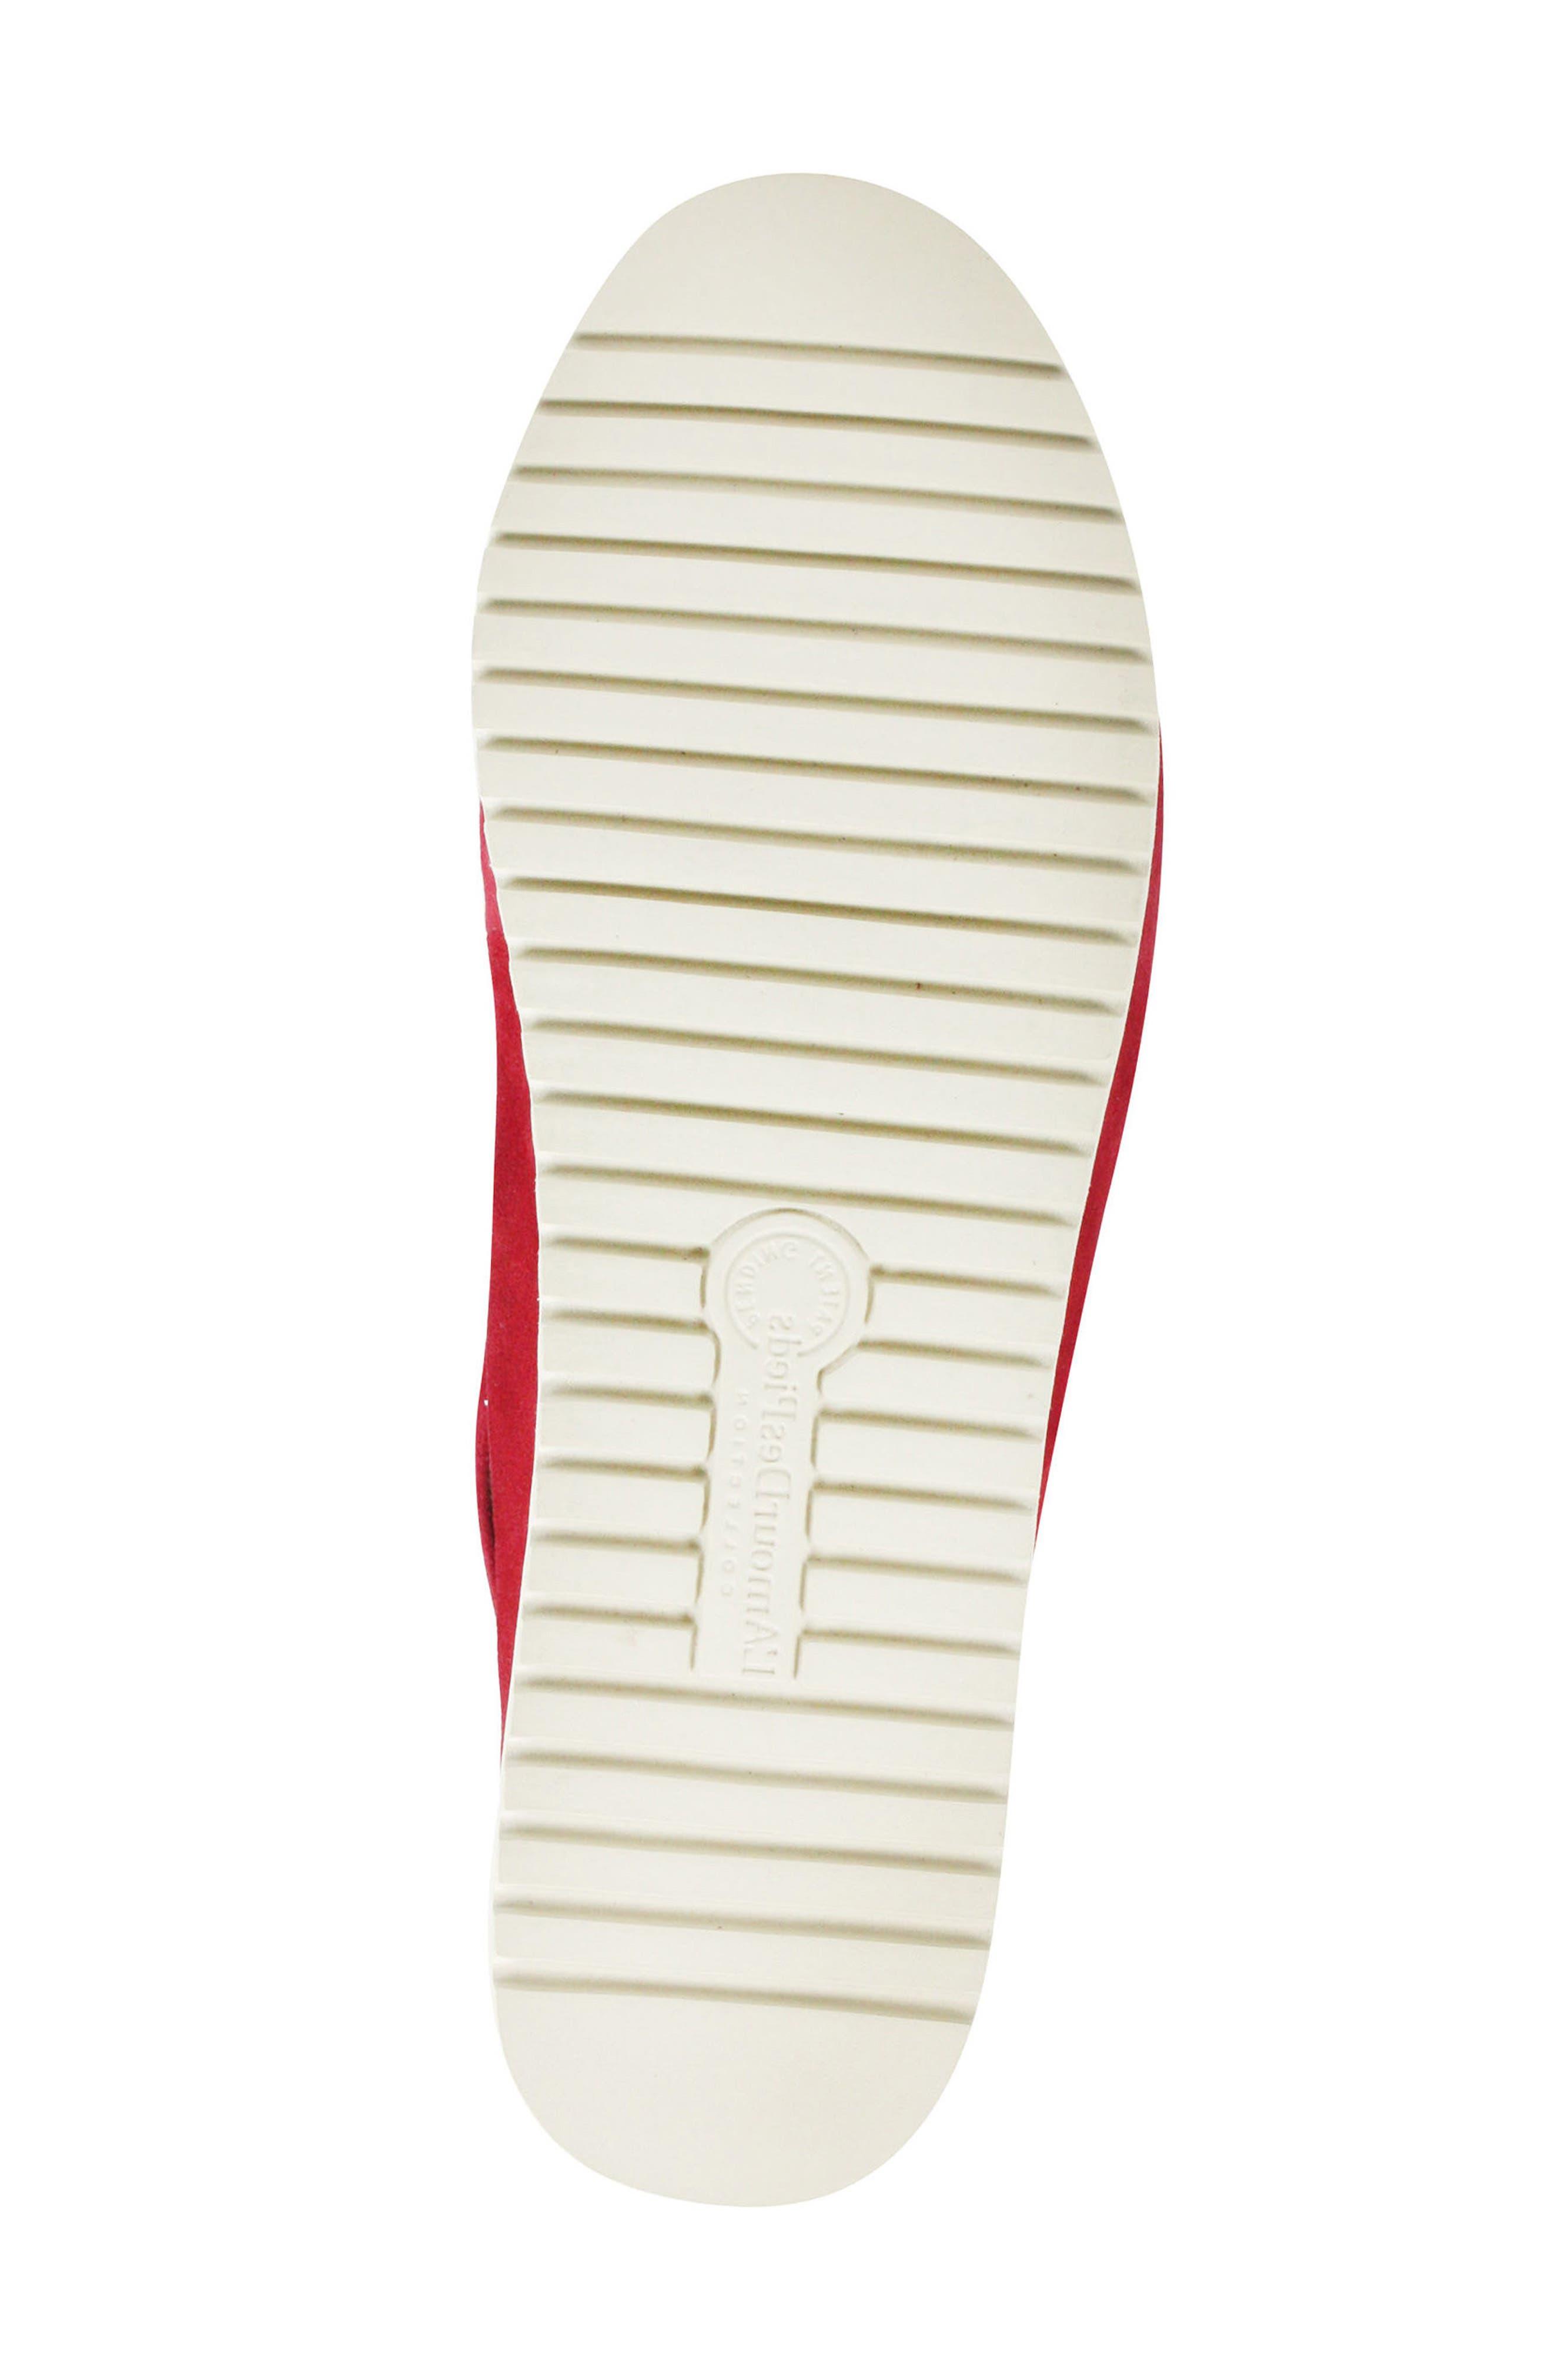 Adalicia Platform Sandal,                             Alternate thumbnail 6, color,                             Bright Red Suede